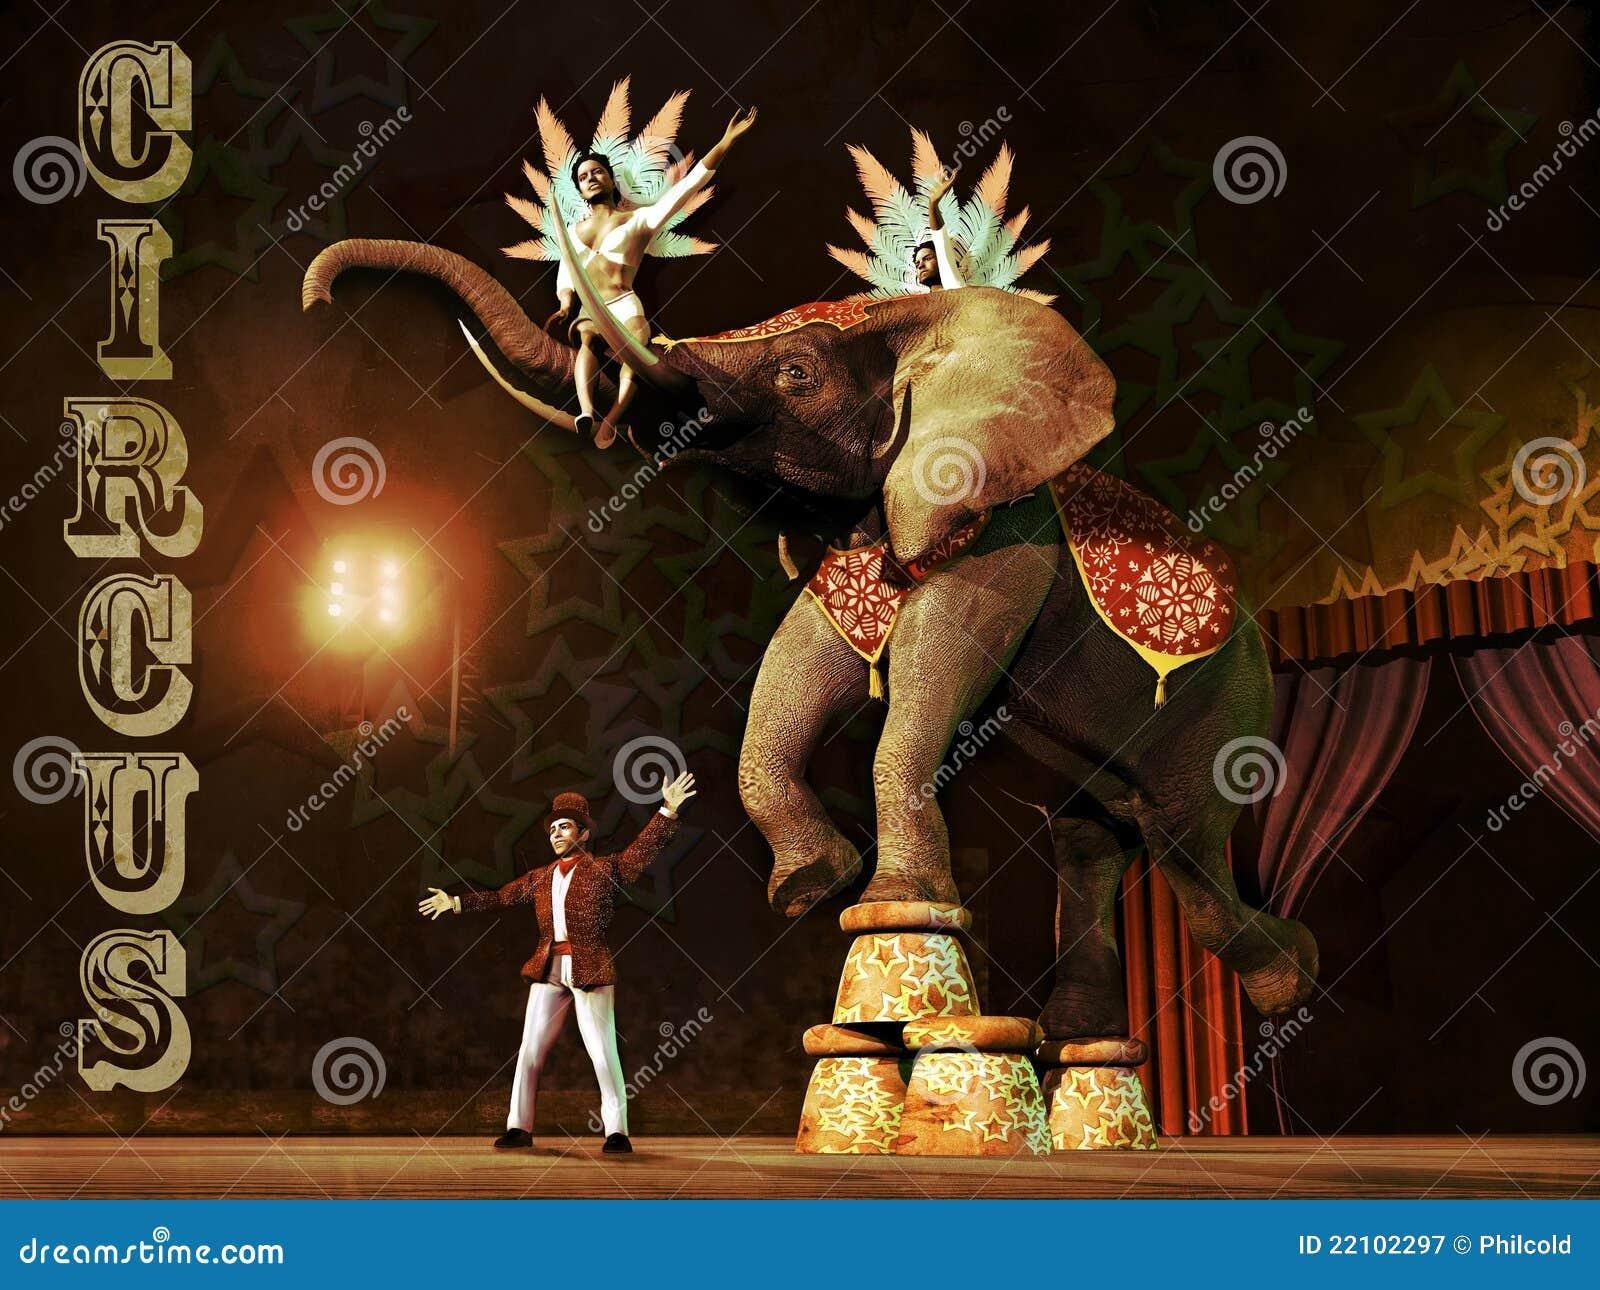 Circus scene